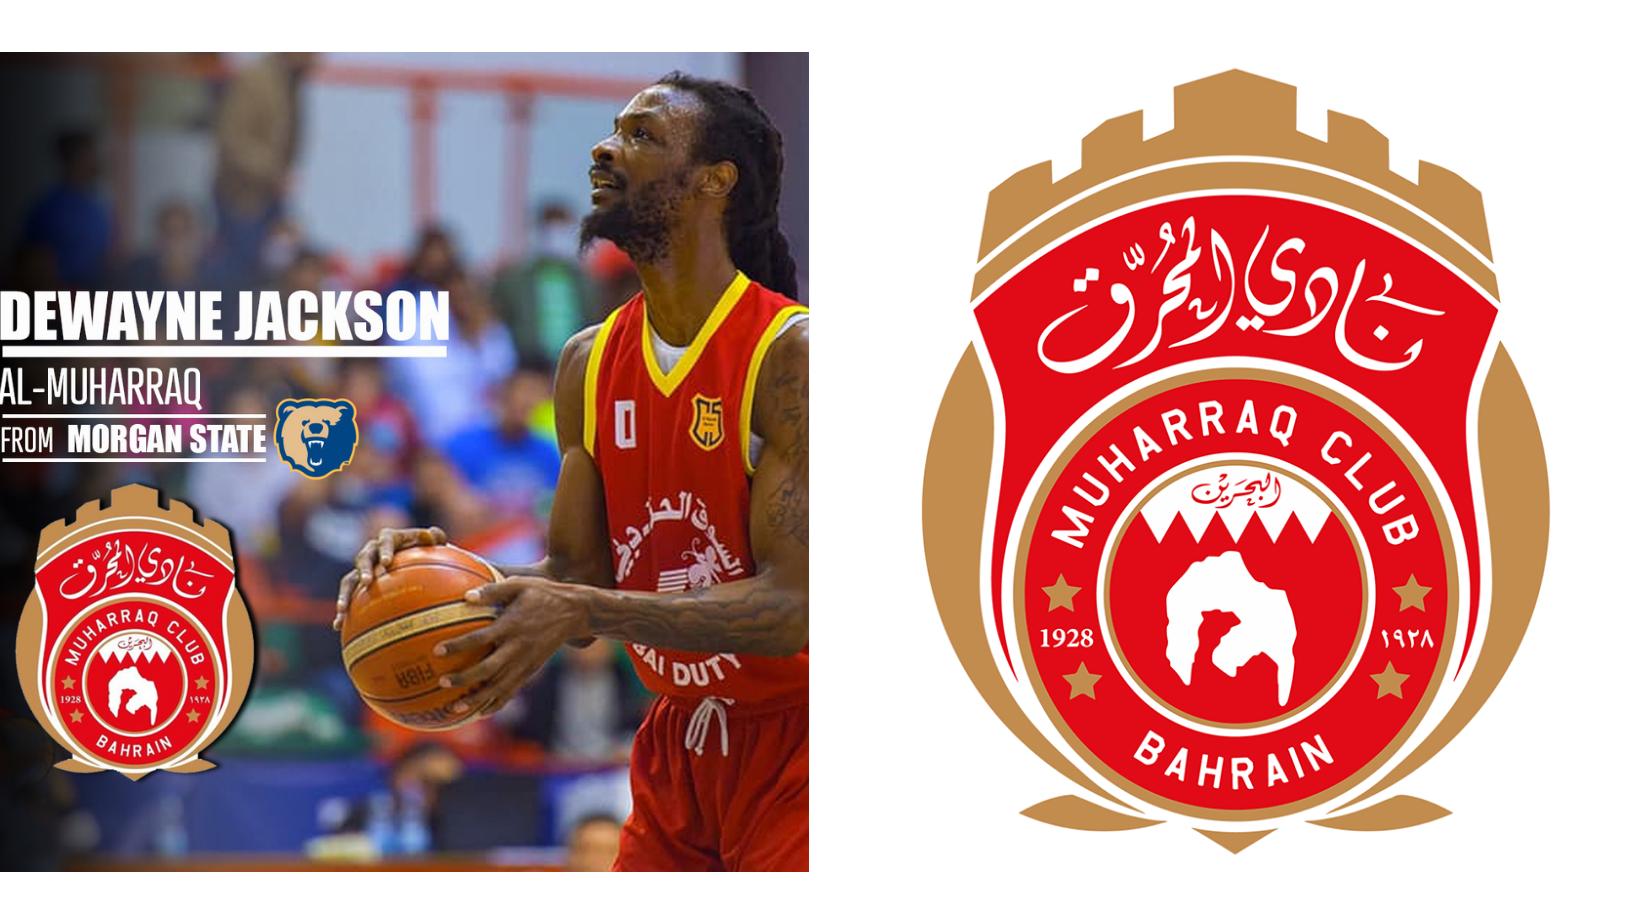 Slam Dunk for Muharraq